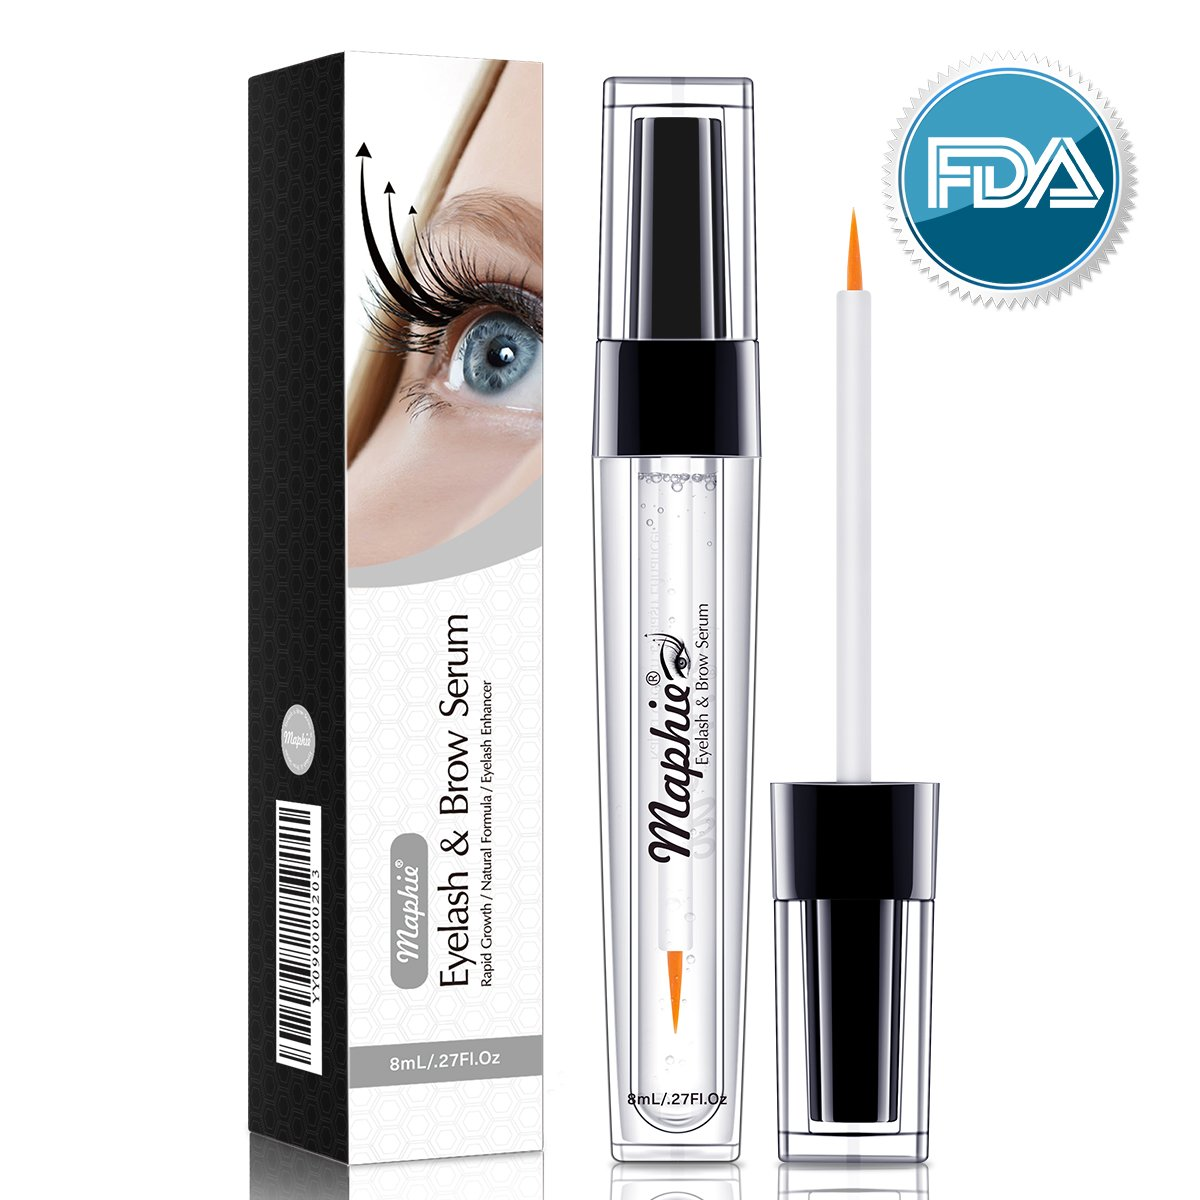 Natural Eyelash Brow Growth Serum8ml Enhancing Lash Boost